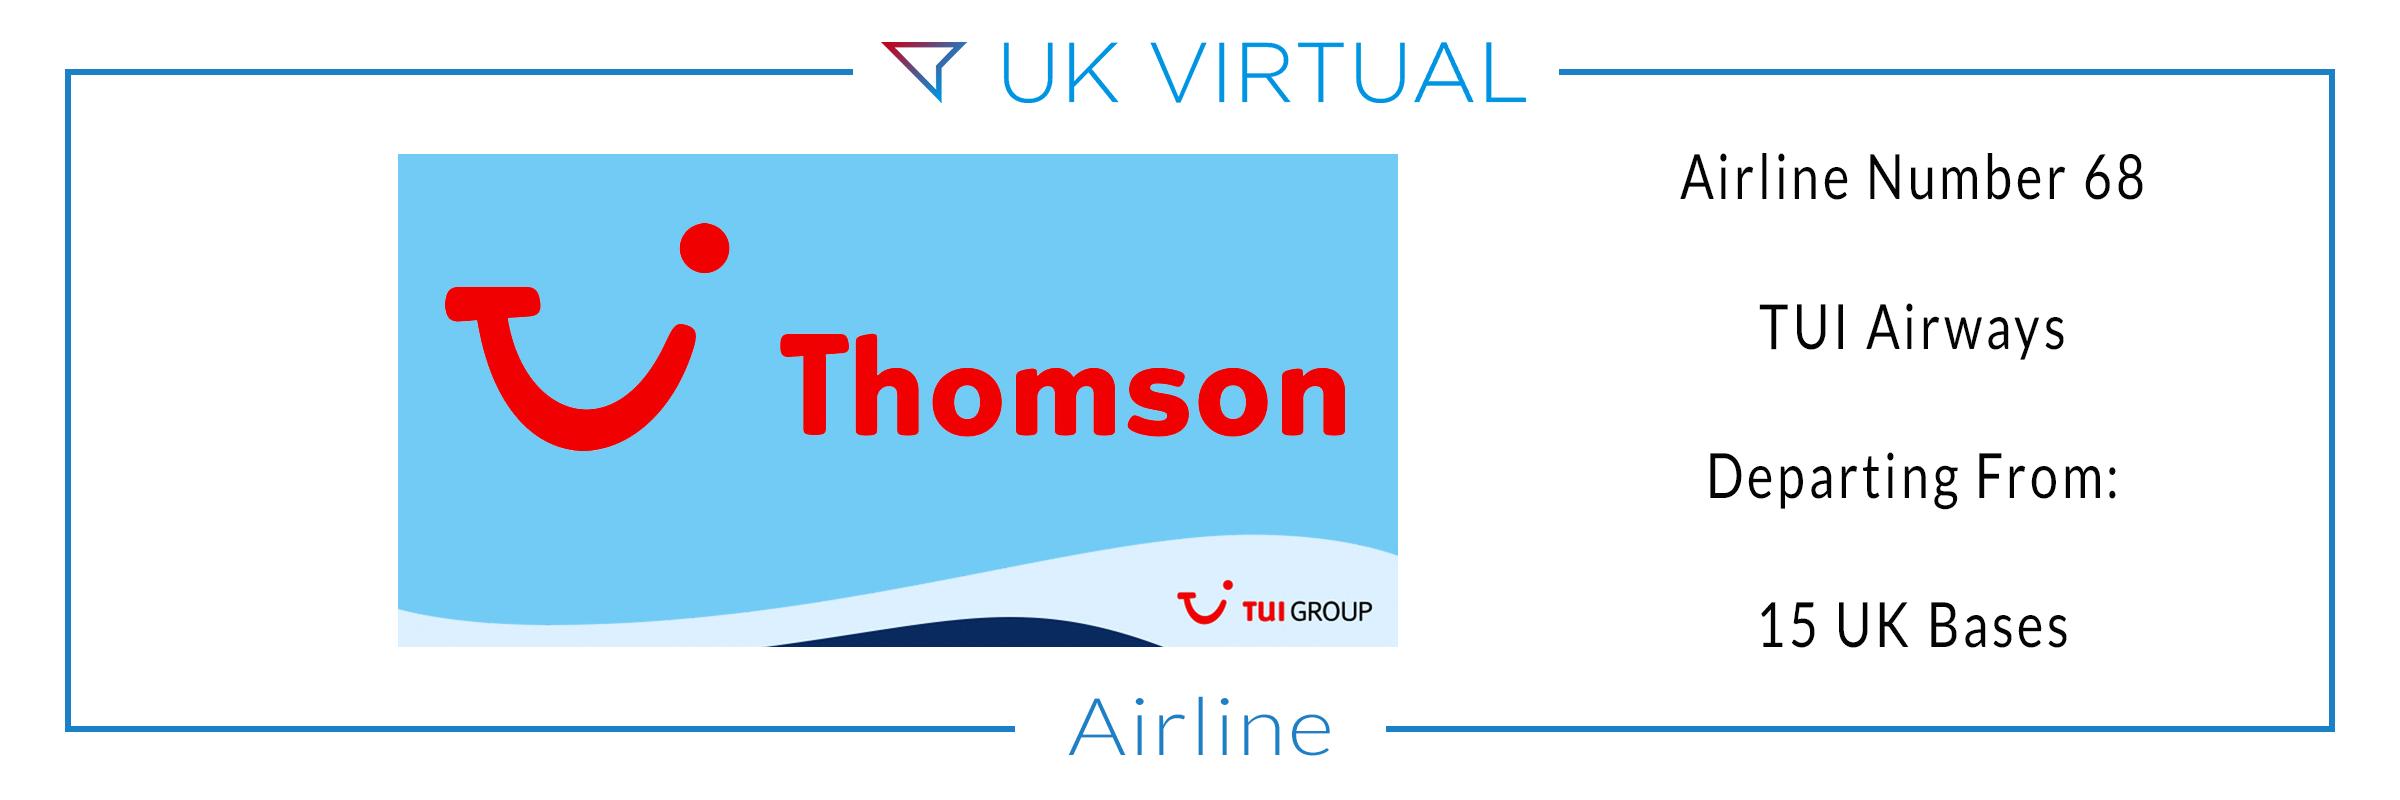 Airline Number 68: TUI Airways